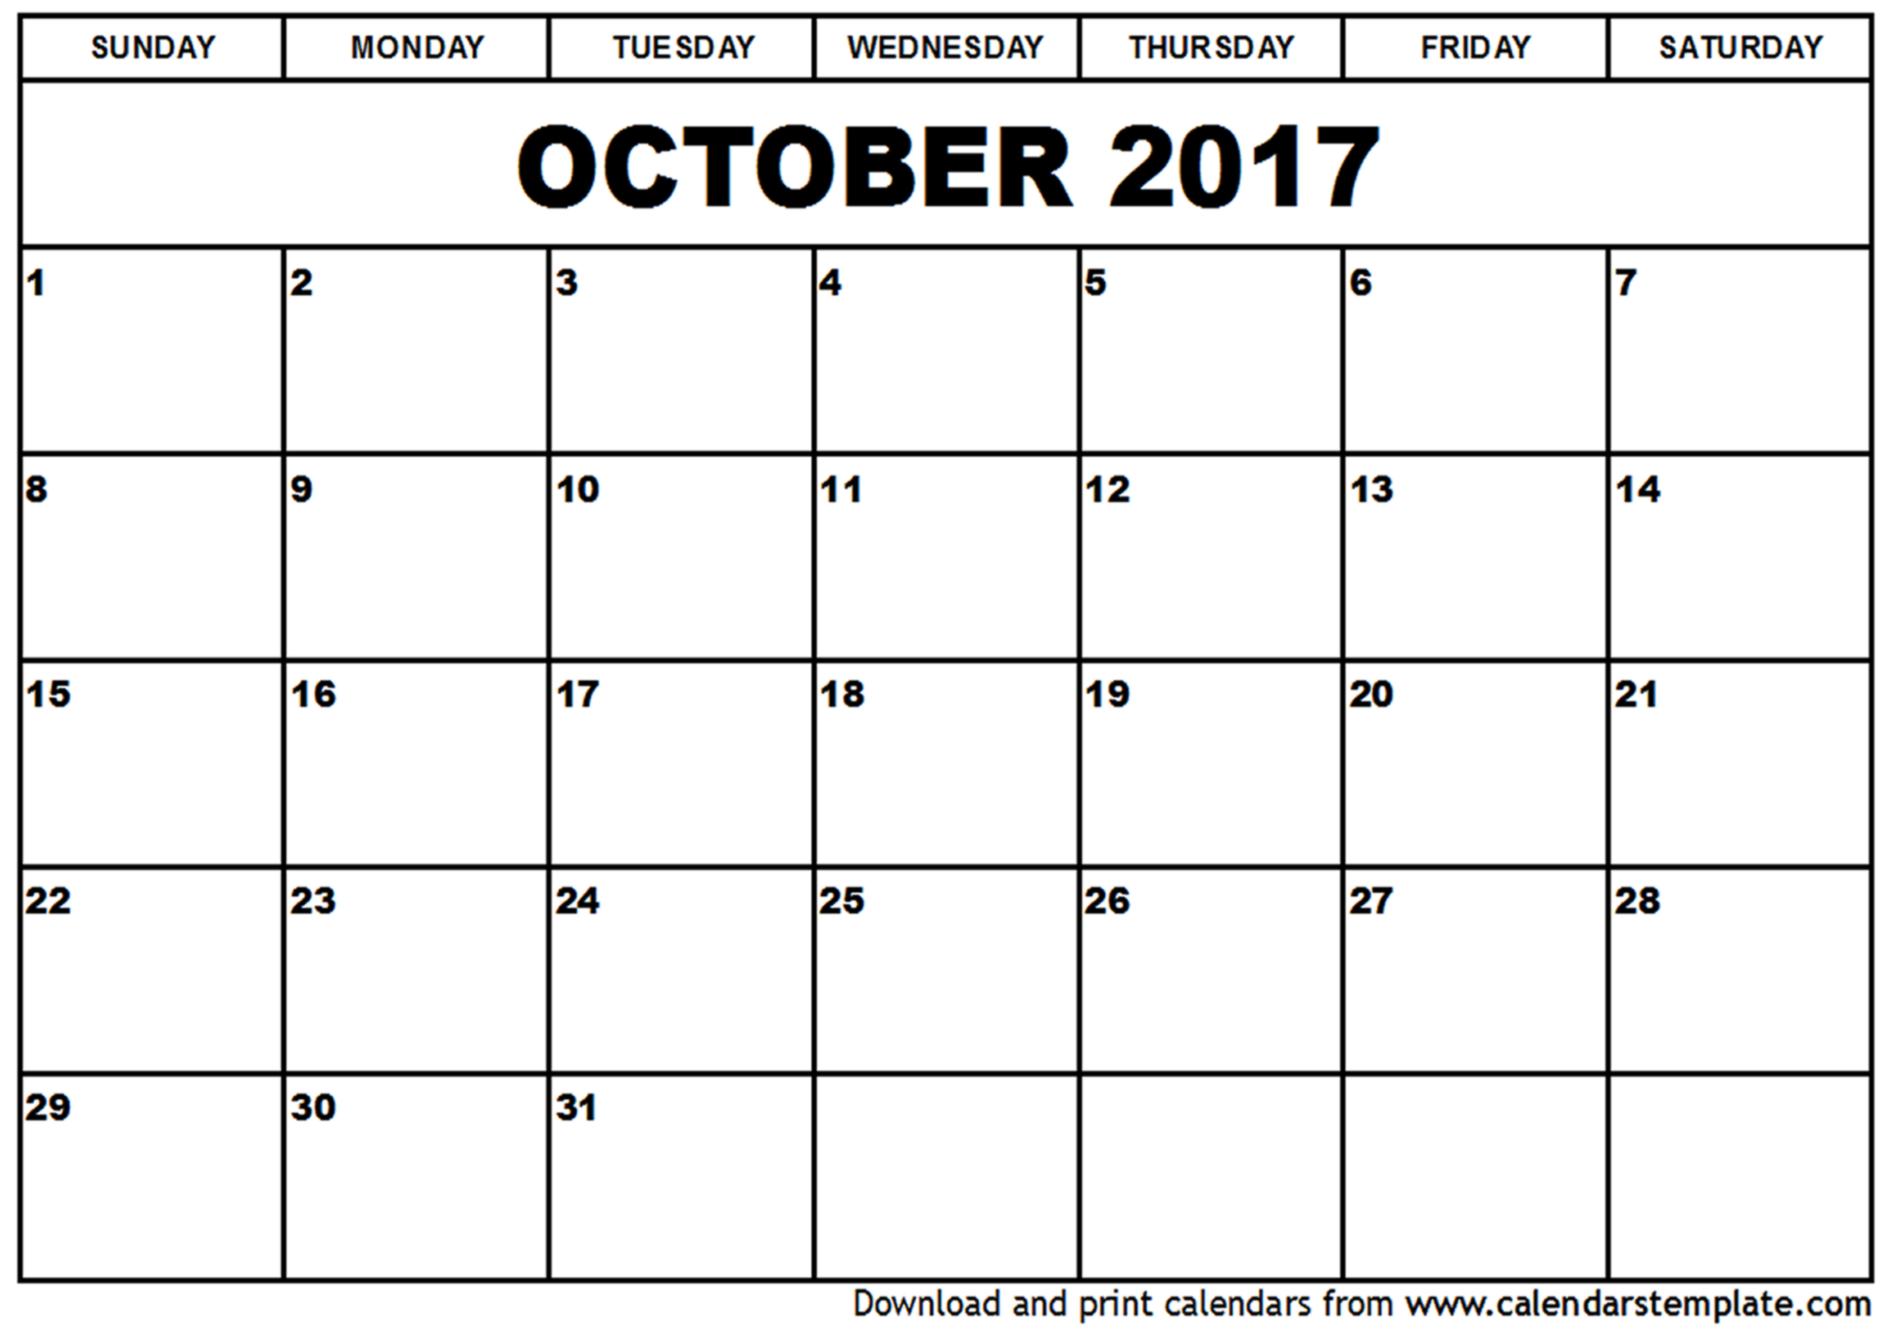 October 2017 Calendar Cute | weekly calendar template